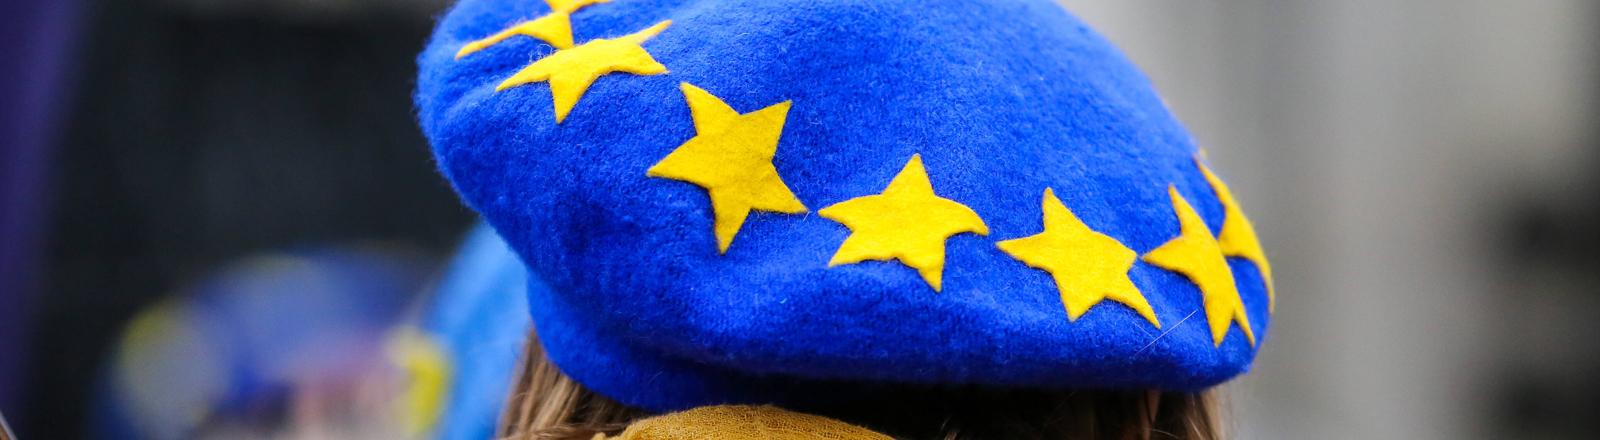 EU-Befürworterin vor dem Houses of Parliament in London am 30.01.20